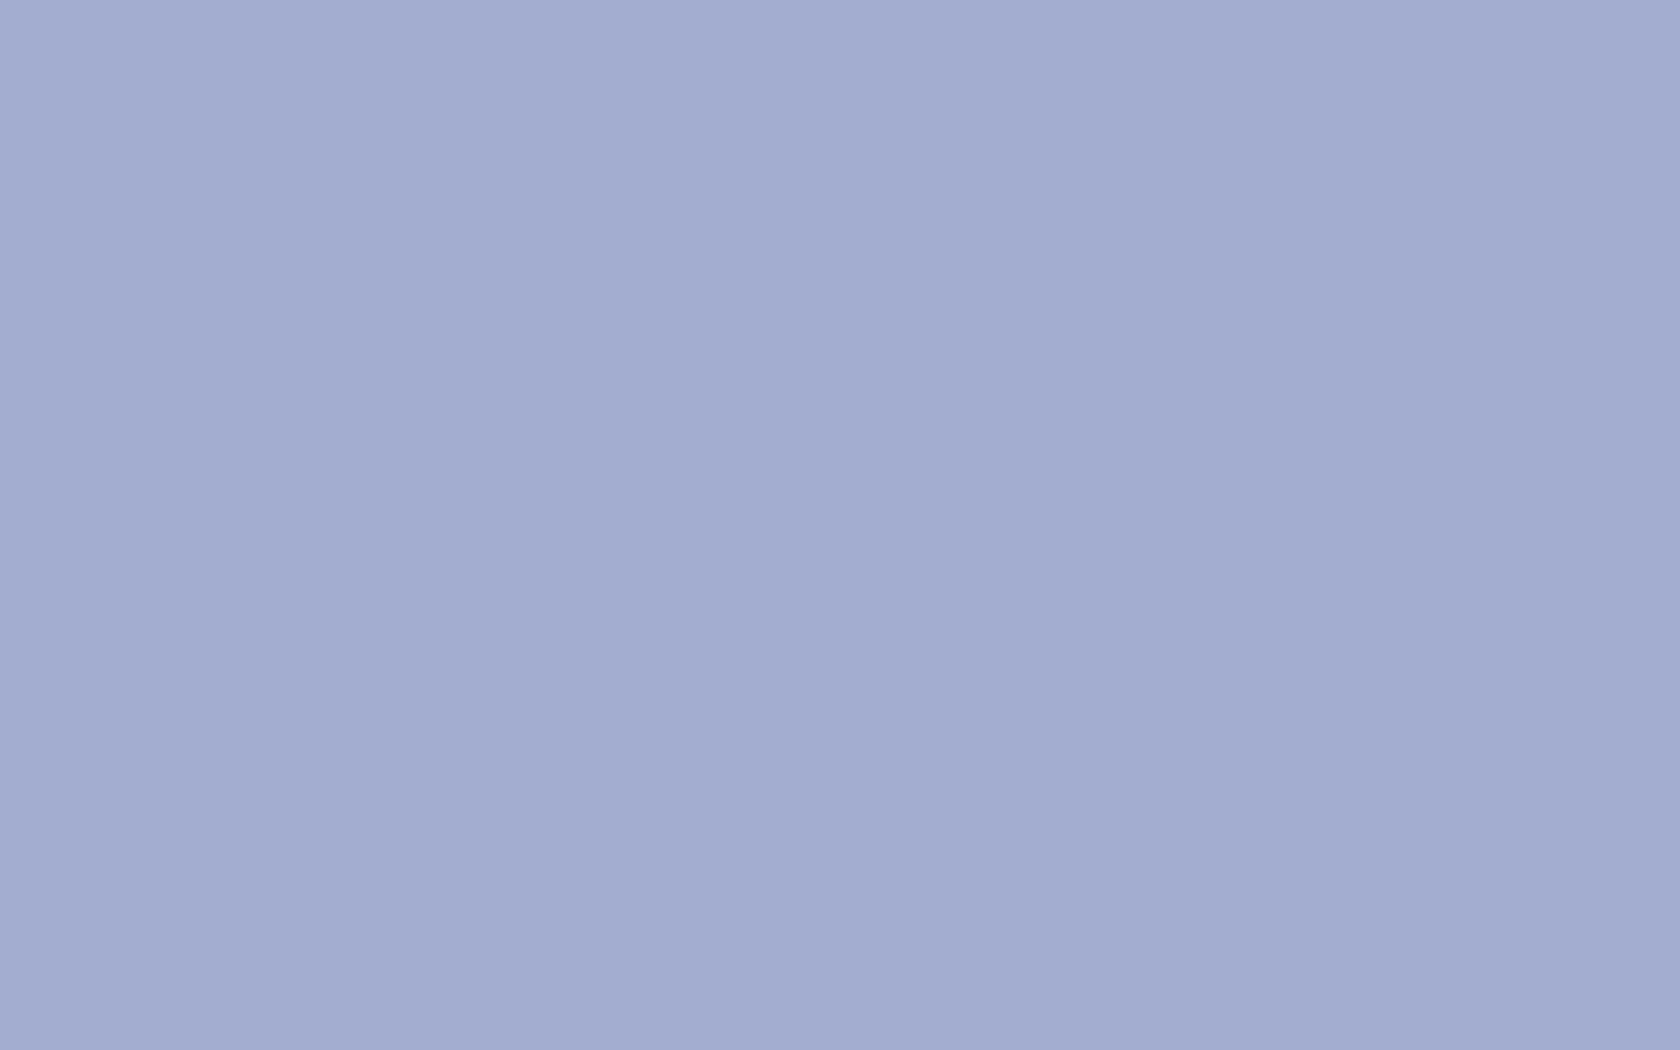 1680x1050 Wild Blue Yonder Solid Color Background